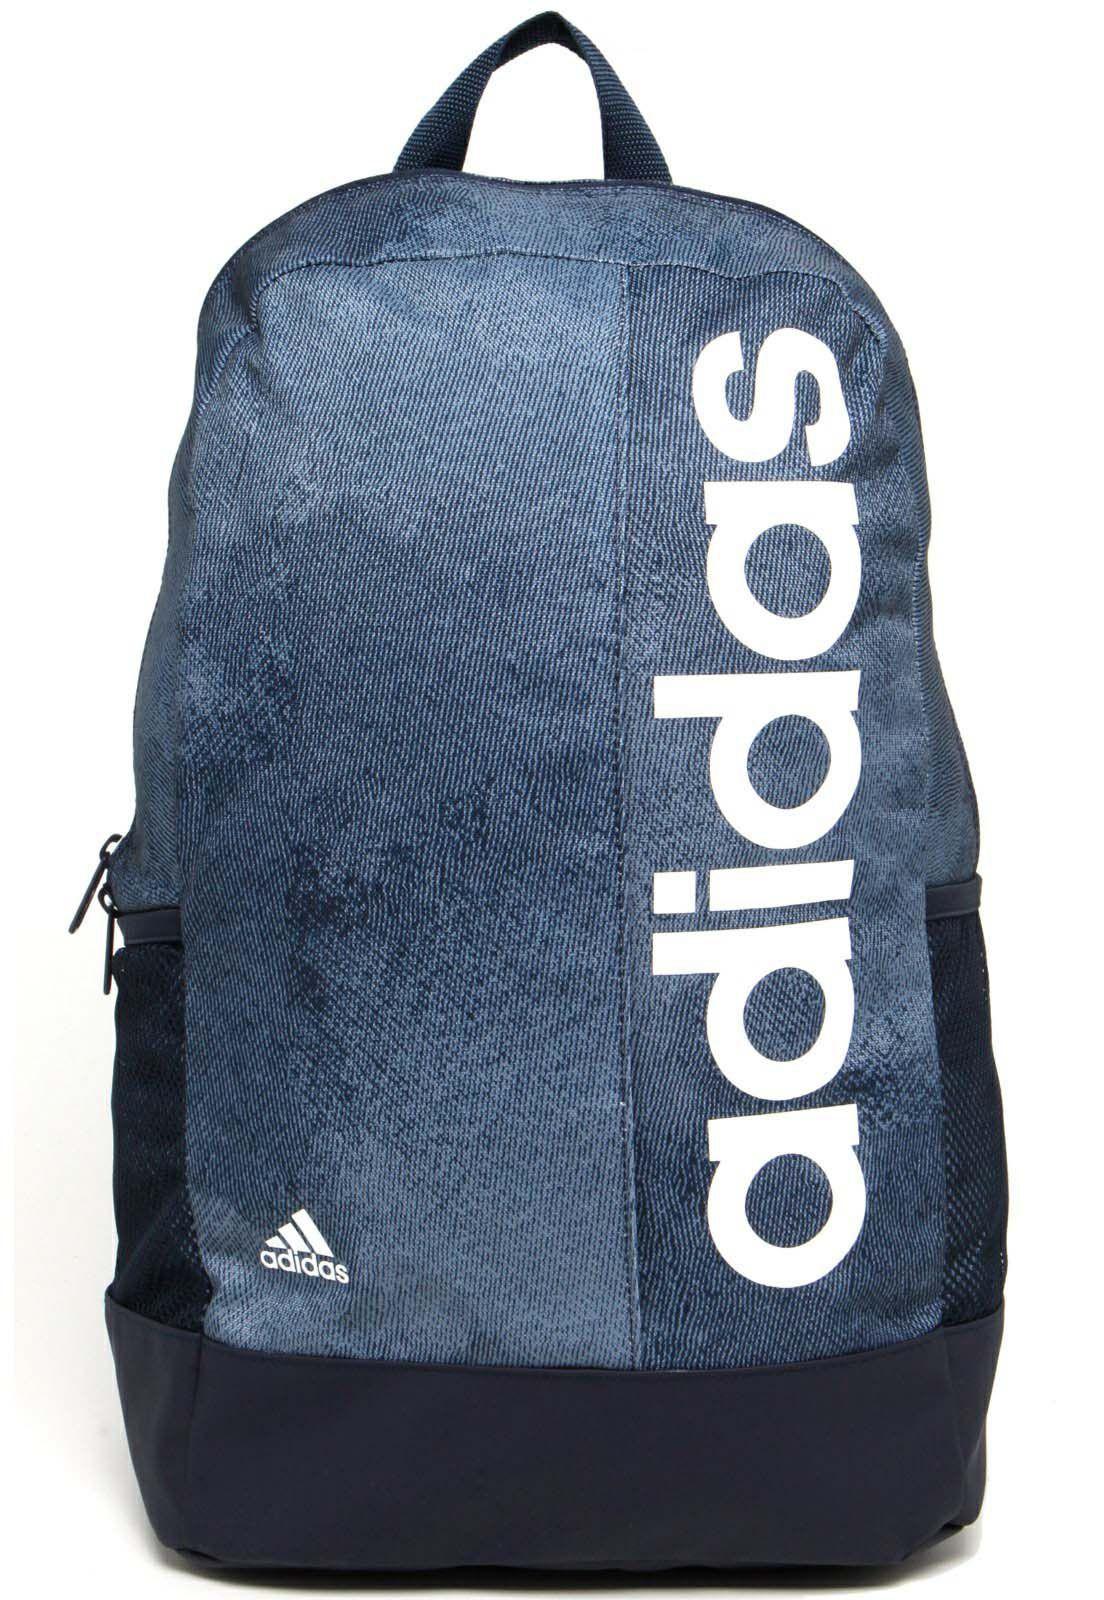 8a7f3e3a1 Mochila Adidas Linear Performance BP